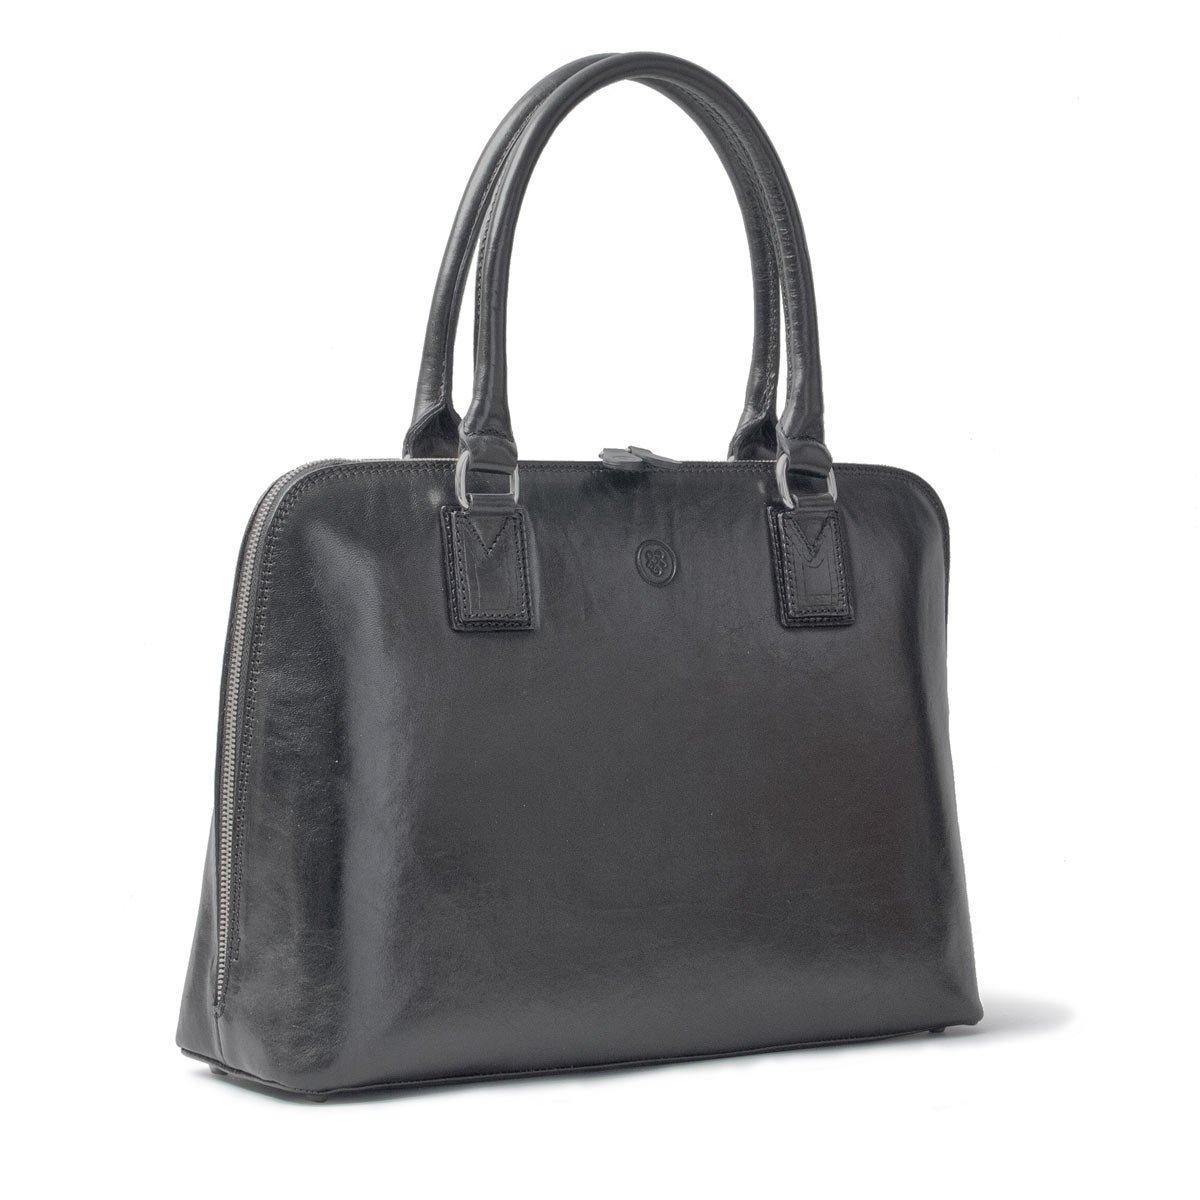 Maxwell Scott Luxury Ladies Black Leather Work Bag Purse for Macbook (Fiorella) by Maxwell Scott Bags (Image #3)